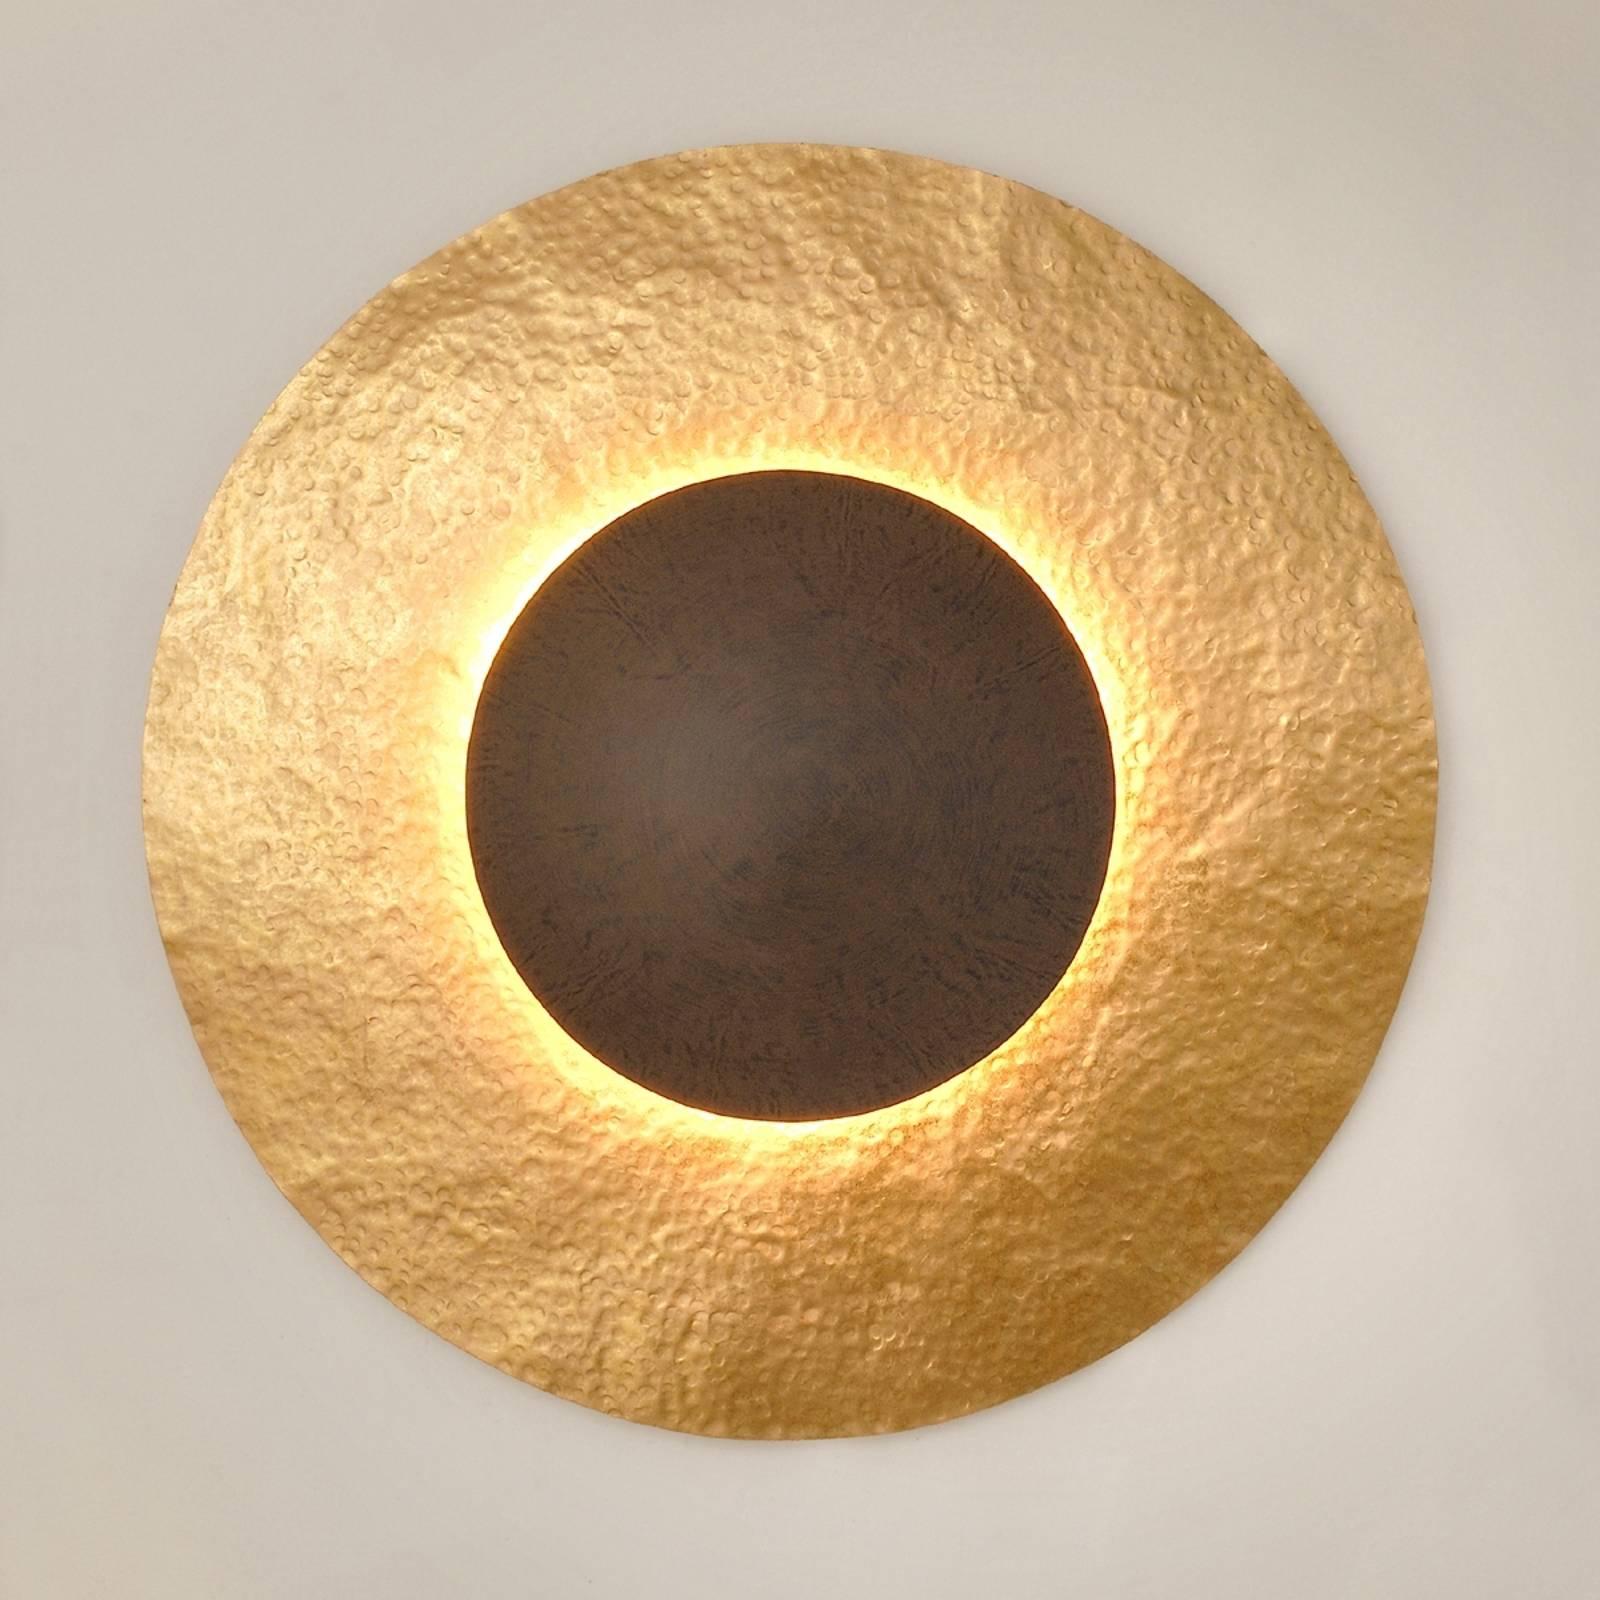 Applique Satellite 2 oro-marrone, Ø 91 cm